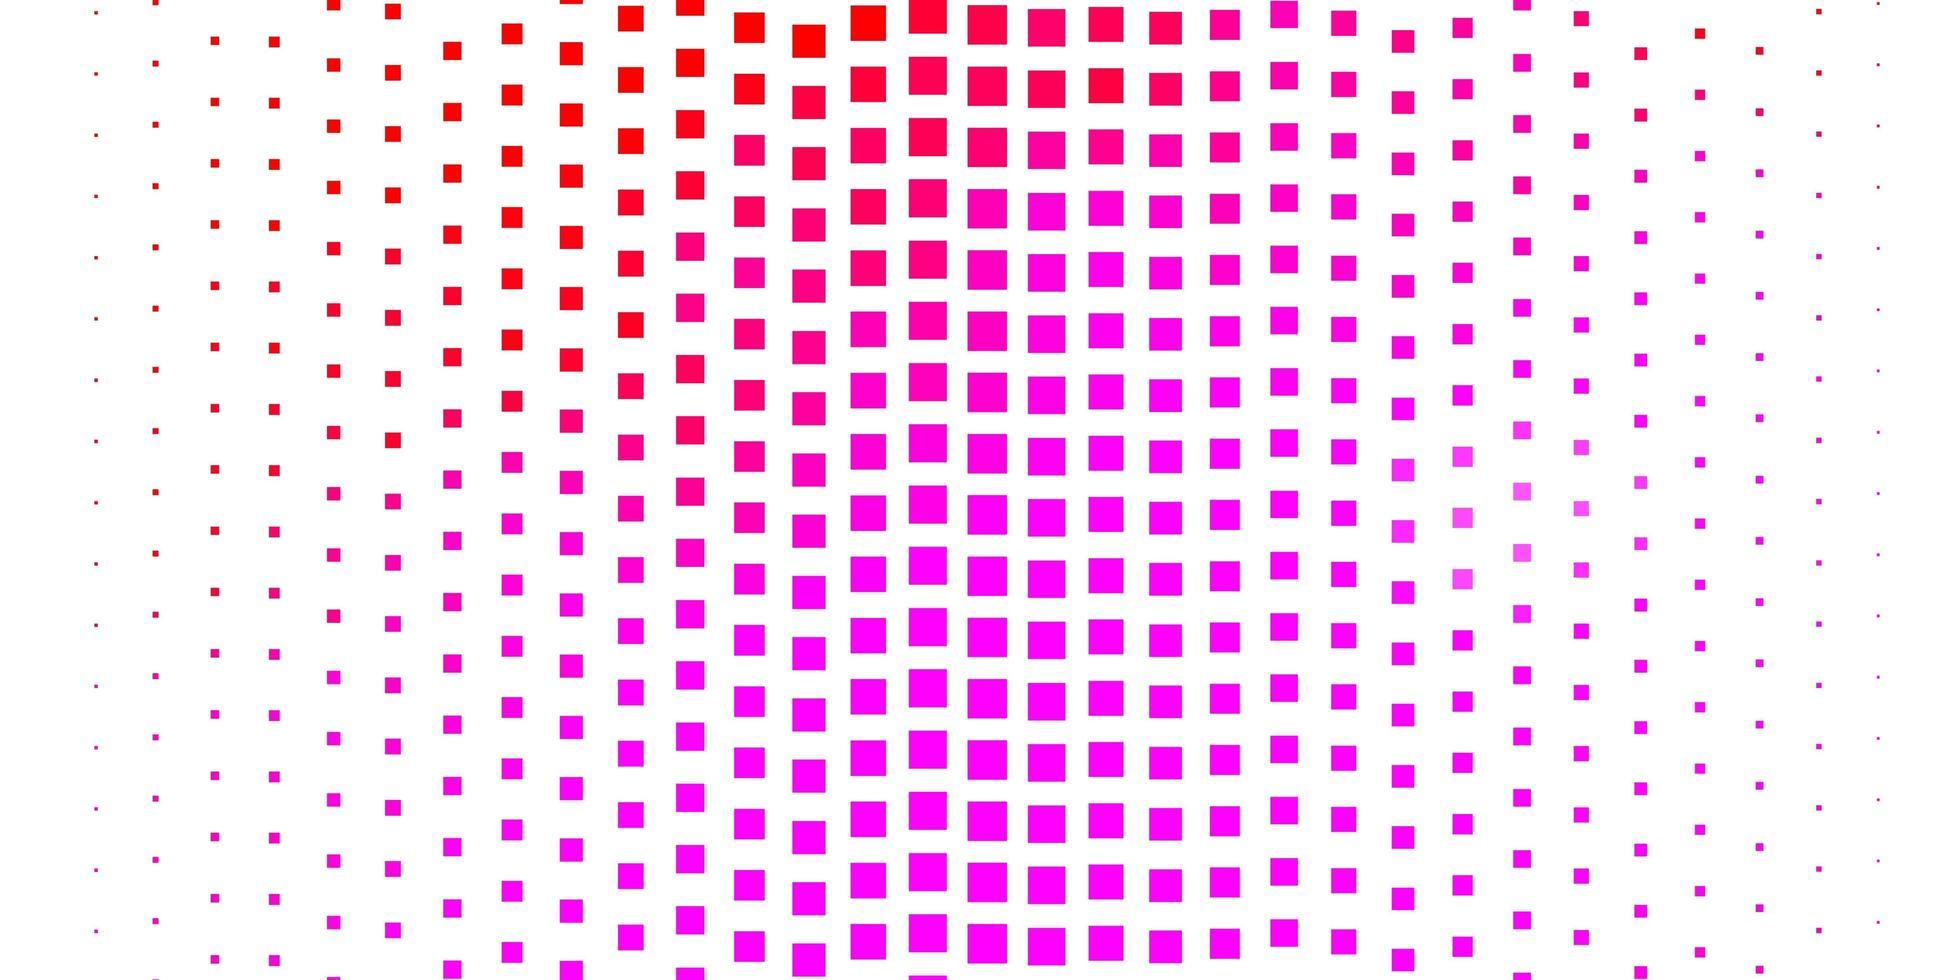 textura rosa clara em estilo retangular. vetor